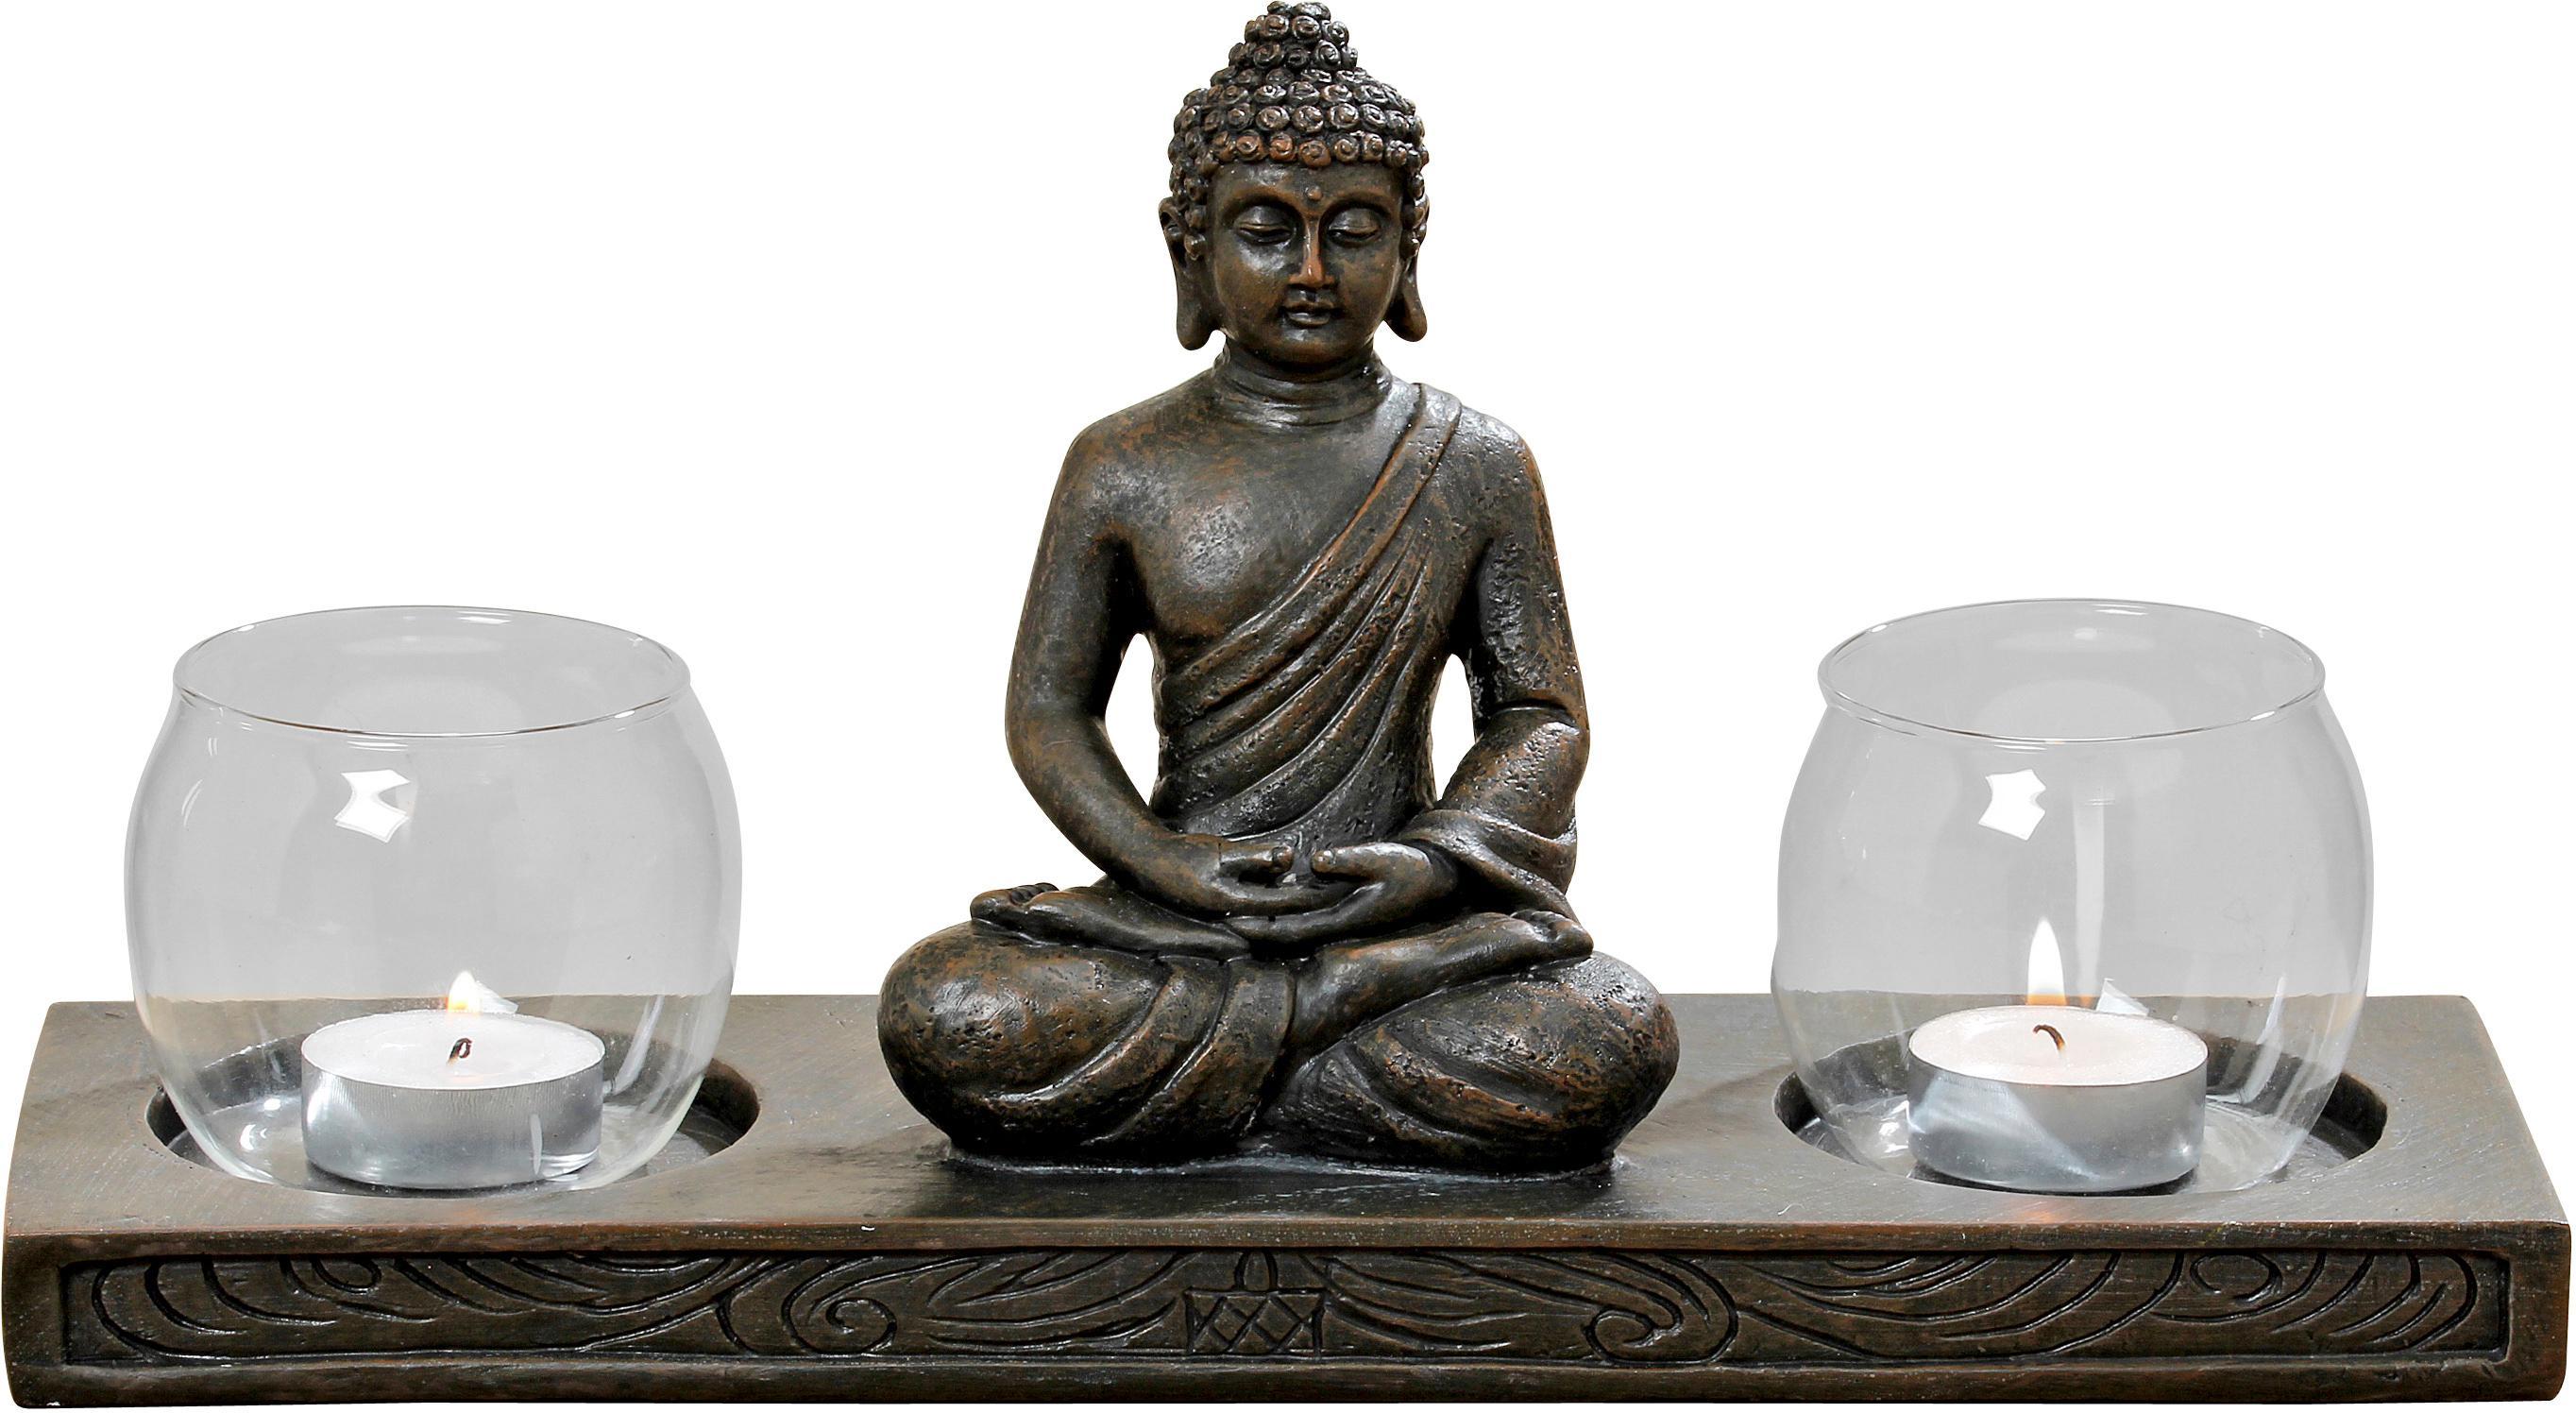 BOLTZE Windlicht Buddha braun Kerzenhalter Kerzen Laternen Wohnaccessoires